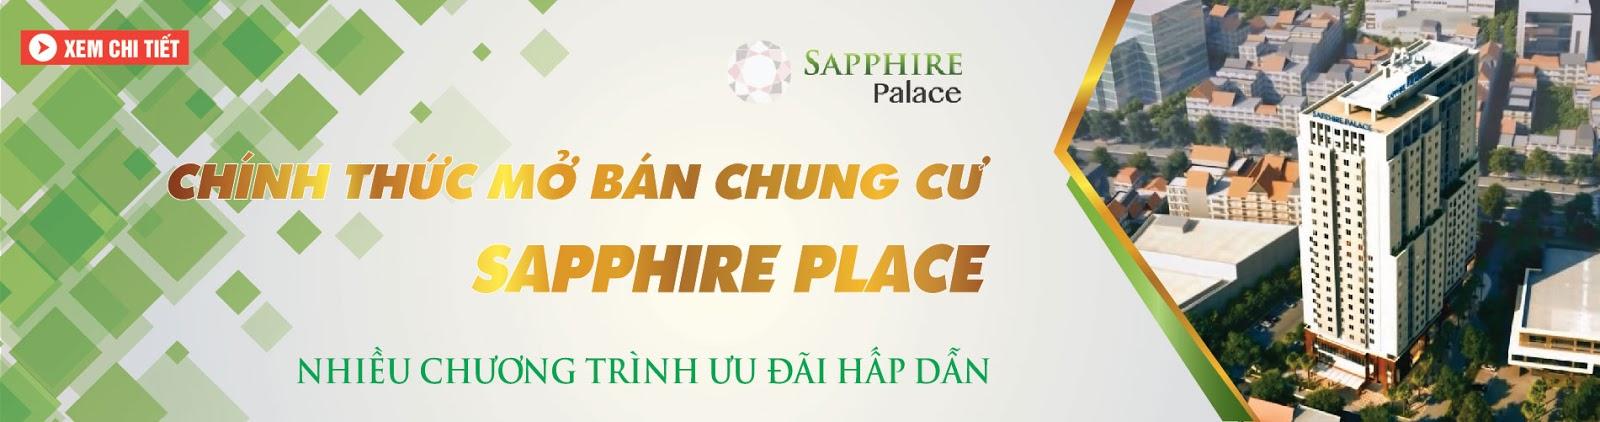 Chung cư Sapphire Palace